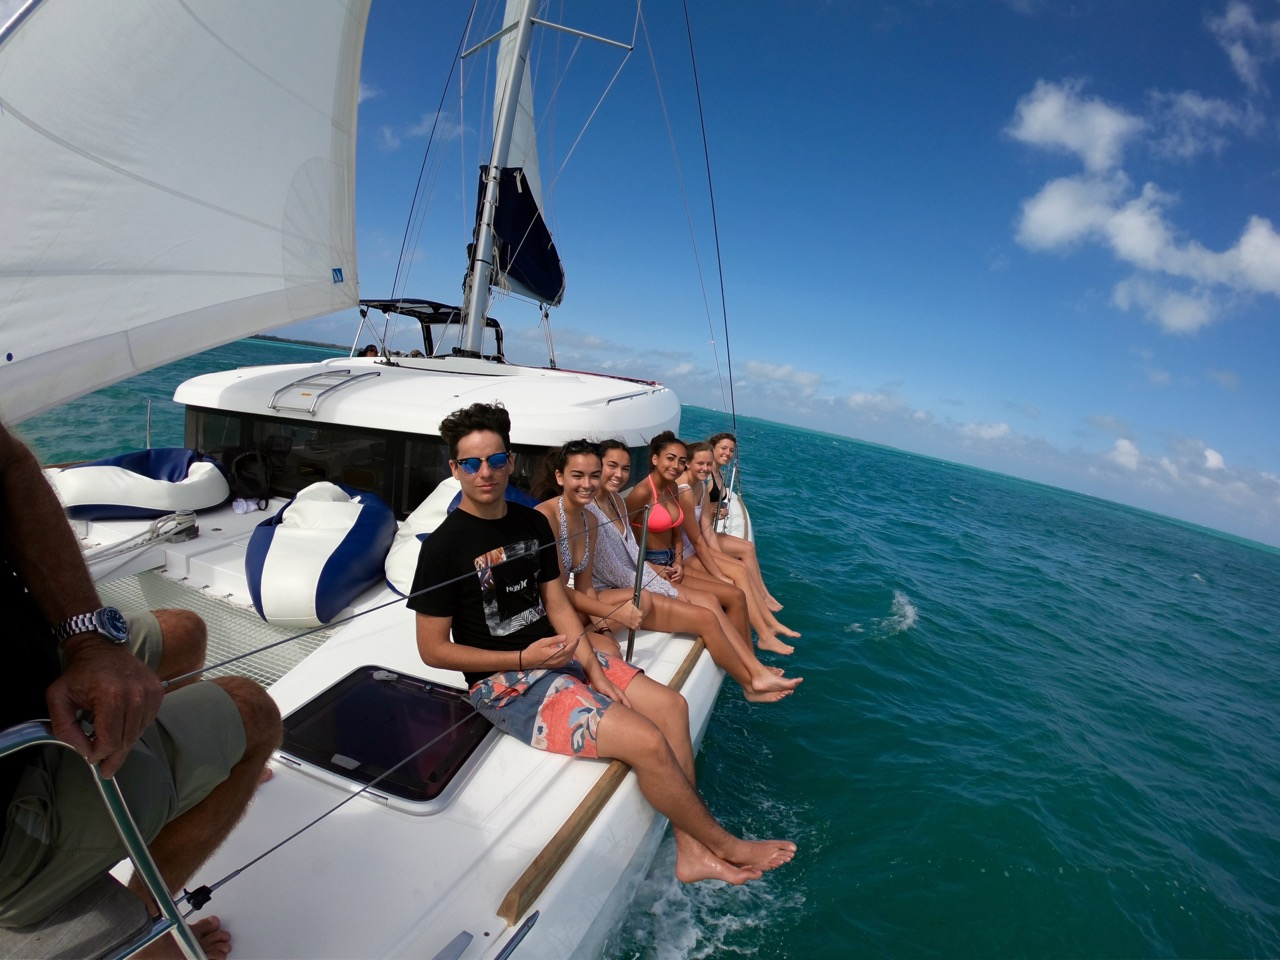 About Cayman Catamarans